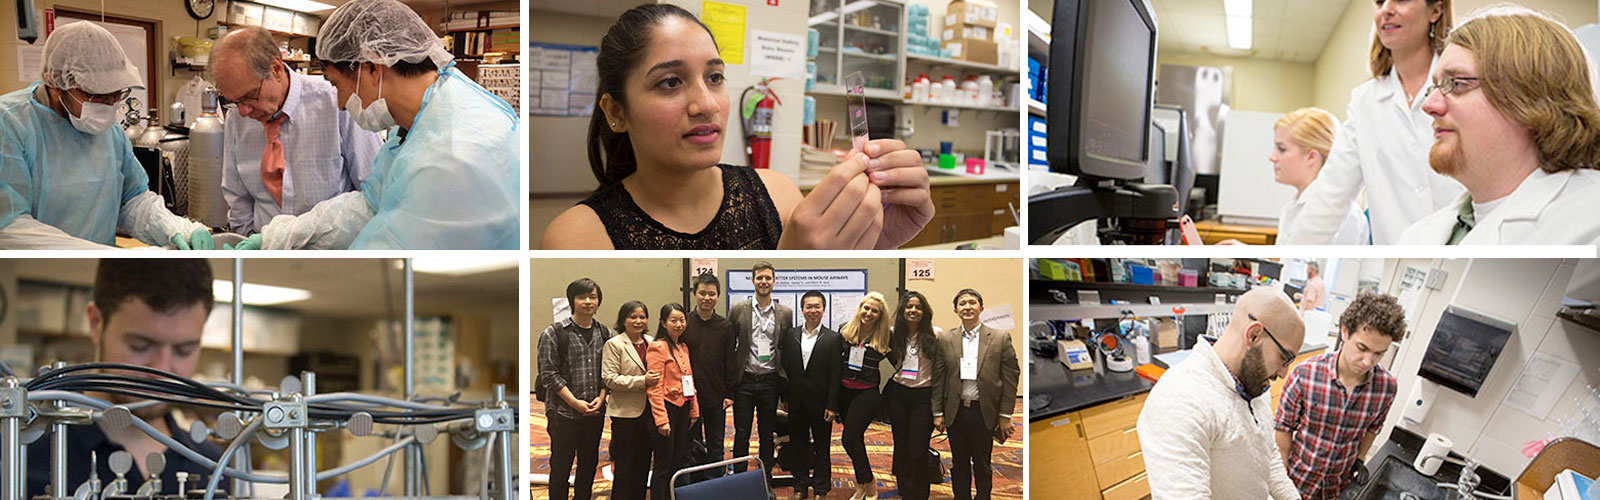 pharmacology and neuroscience